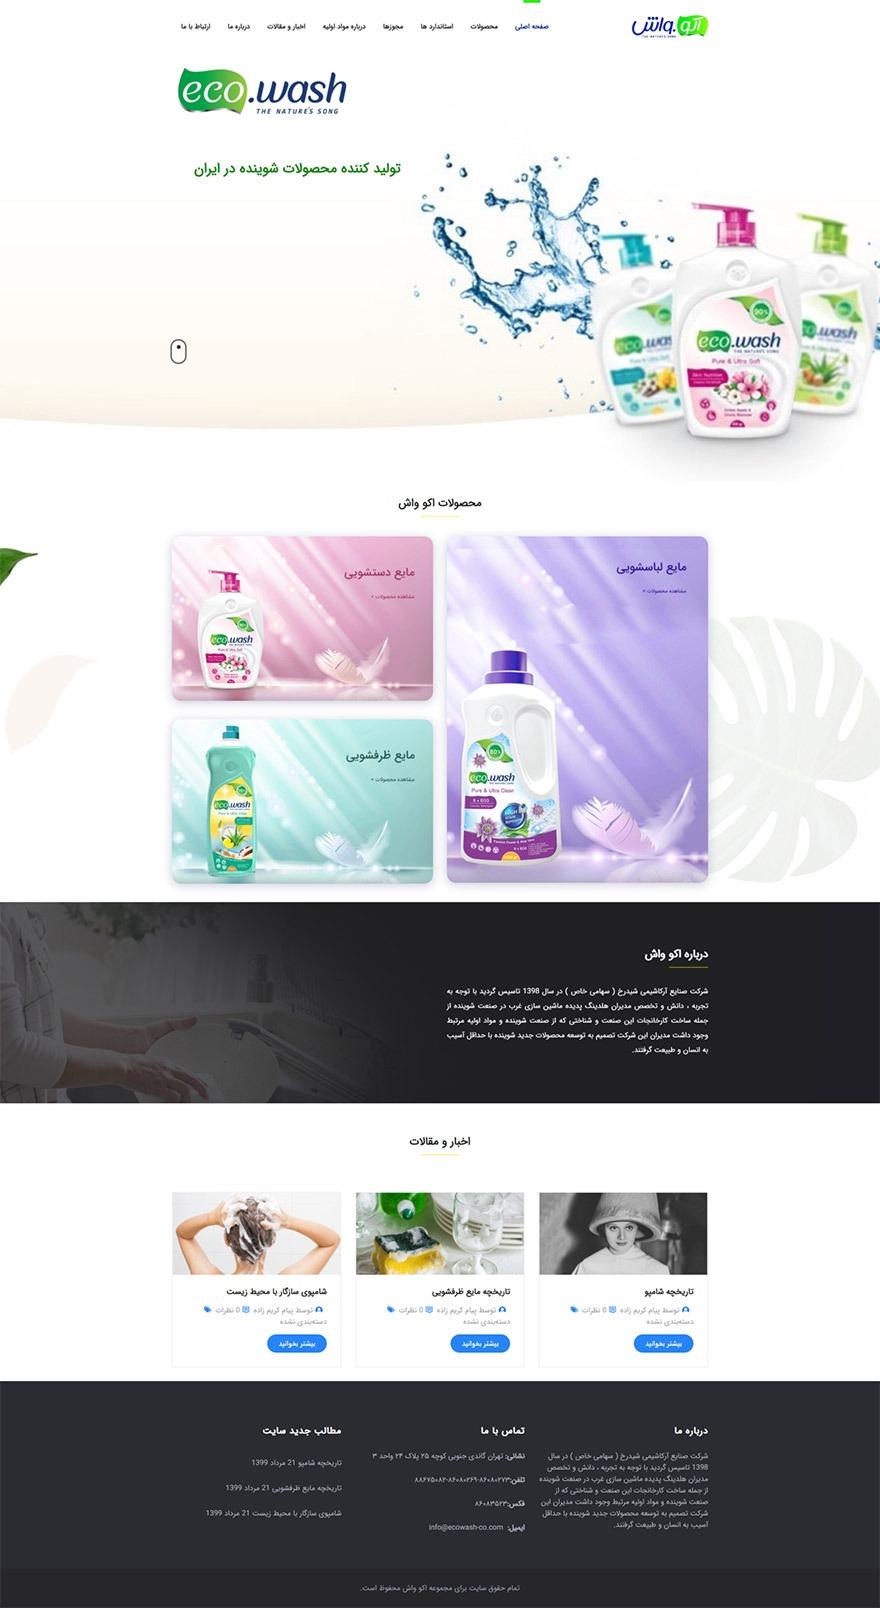 طراحی سایت اکو واش